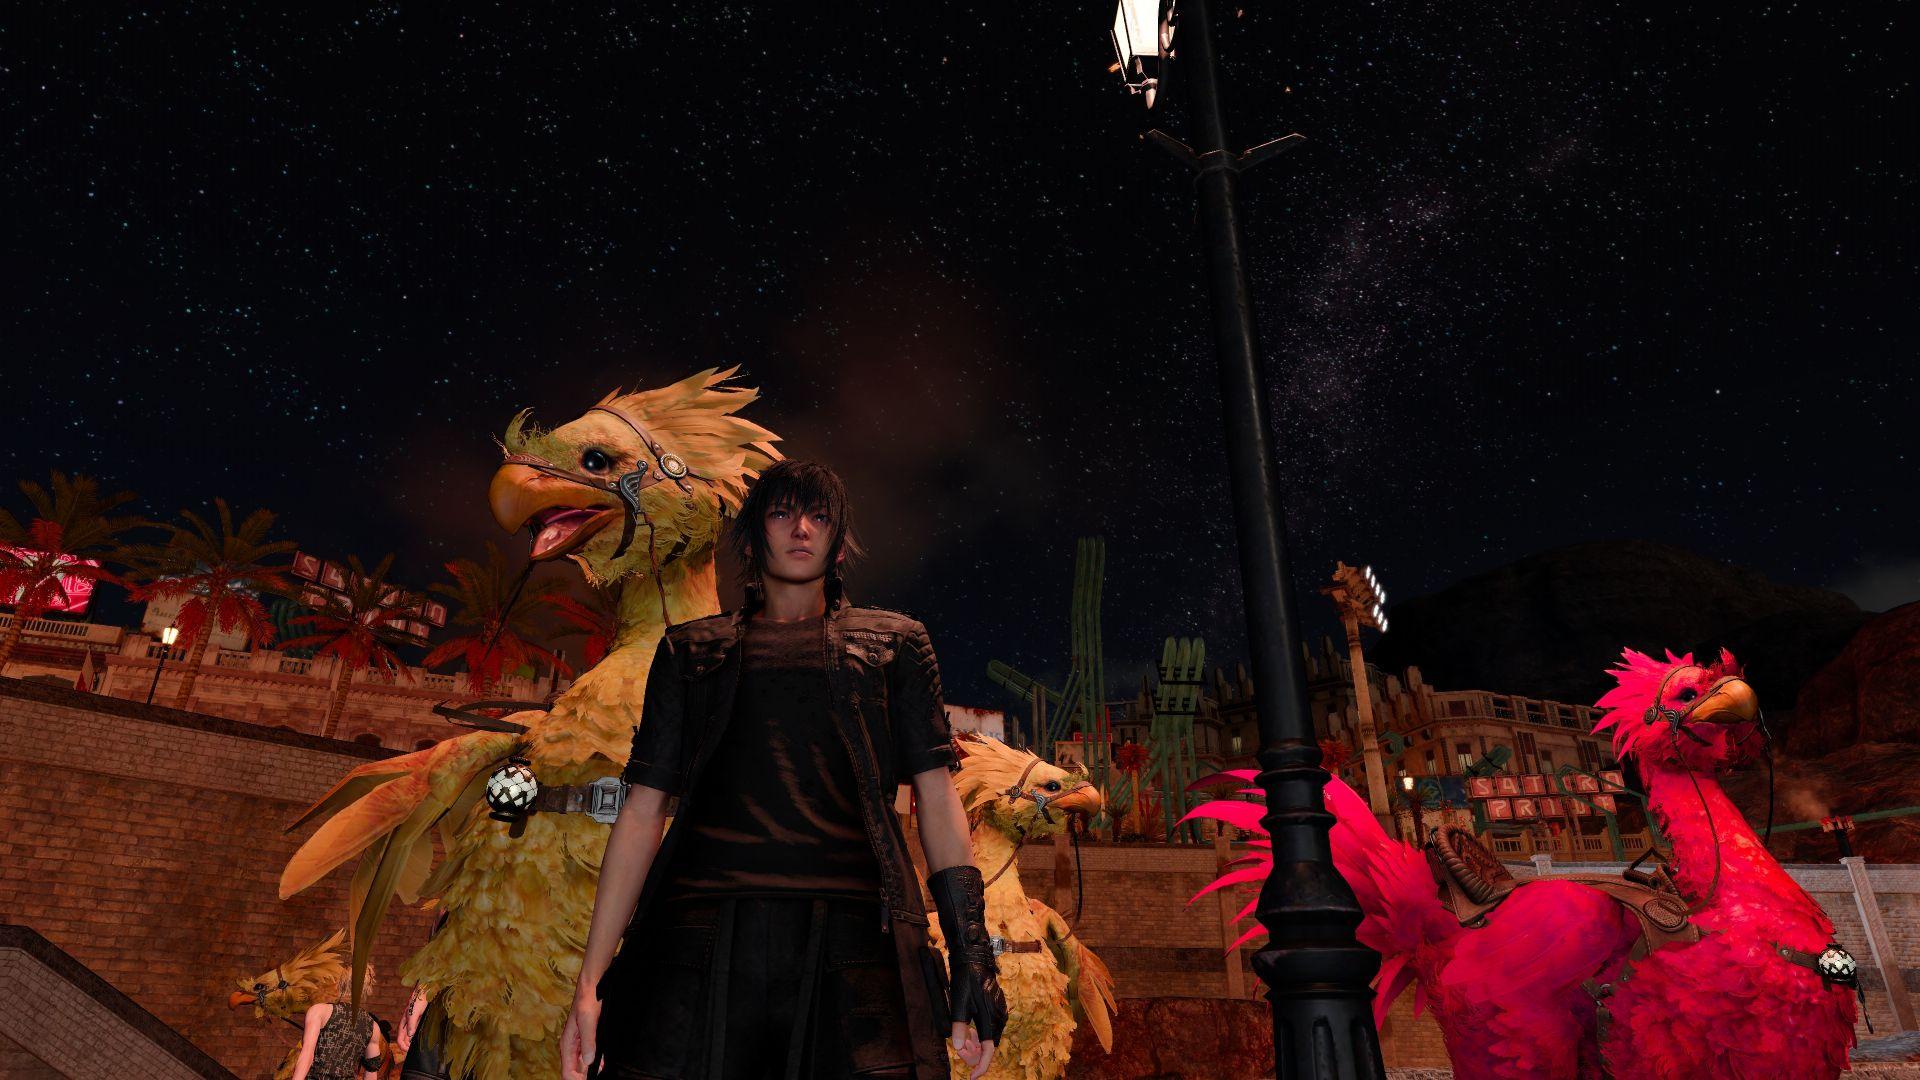 Final Fantasy Xv Windows Edition 4k Hd Games 4k: Wallpaper Final Fantasy XV Windows Edition, Screenshot, 4K